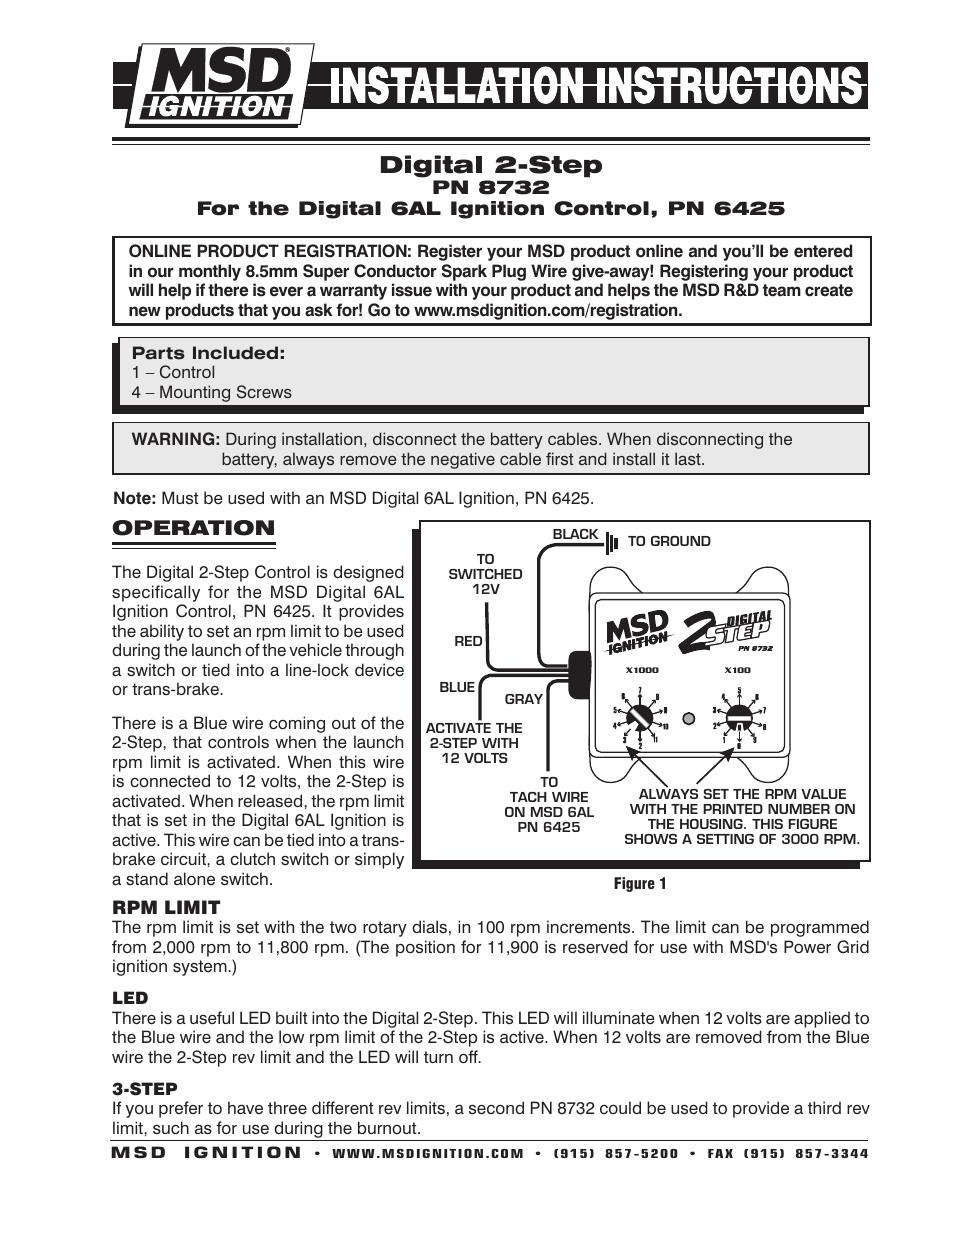 msd pn 6425 wiring diagram Msd Pn 6425 Wiring Diagram msd 6425 6al digital wiring diagram msd pn 6425 wiring diagram